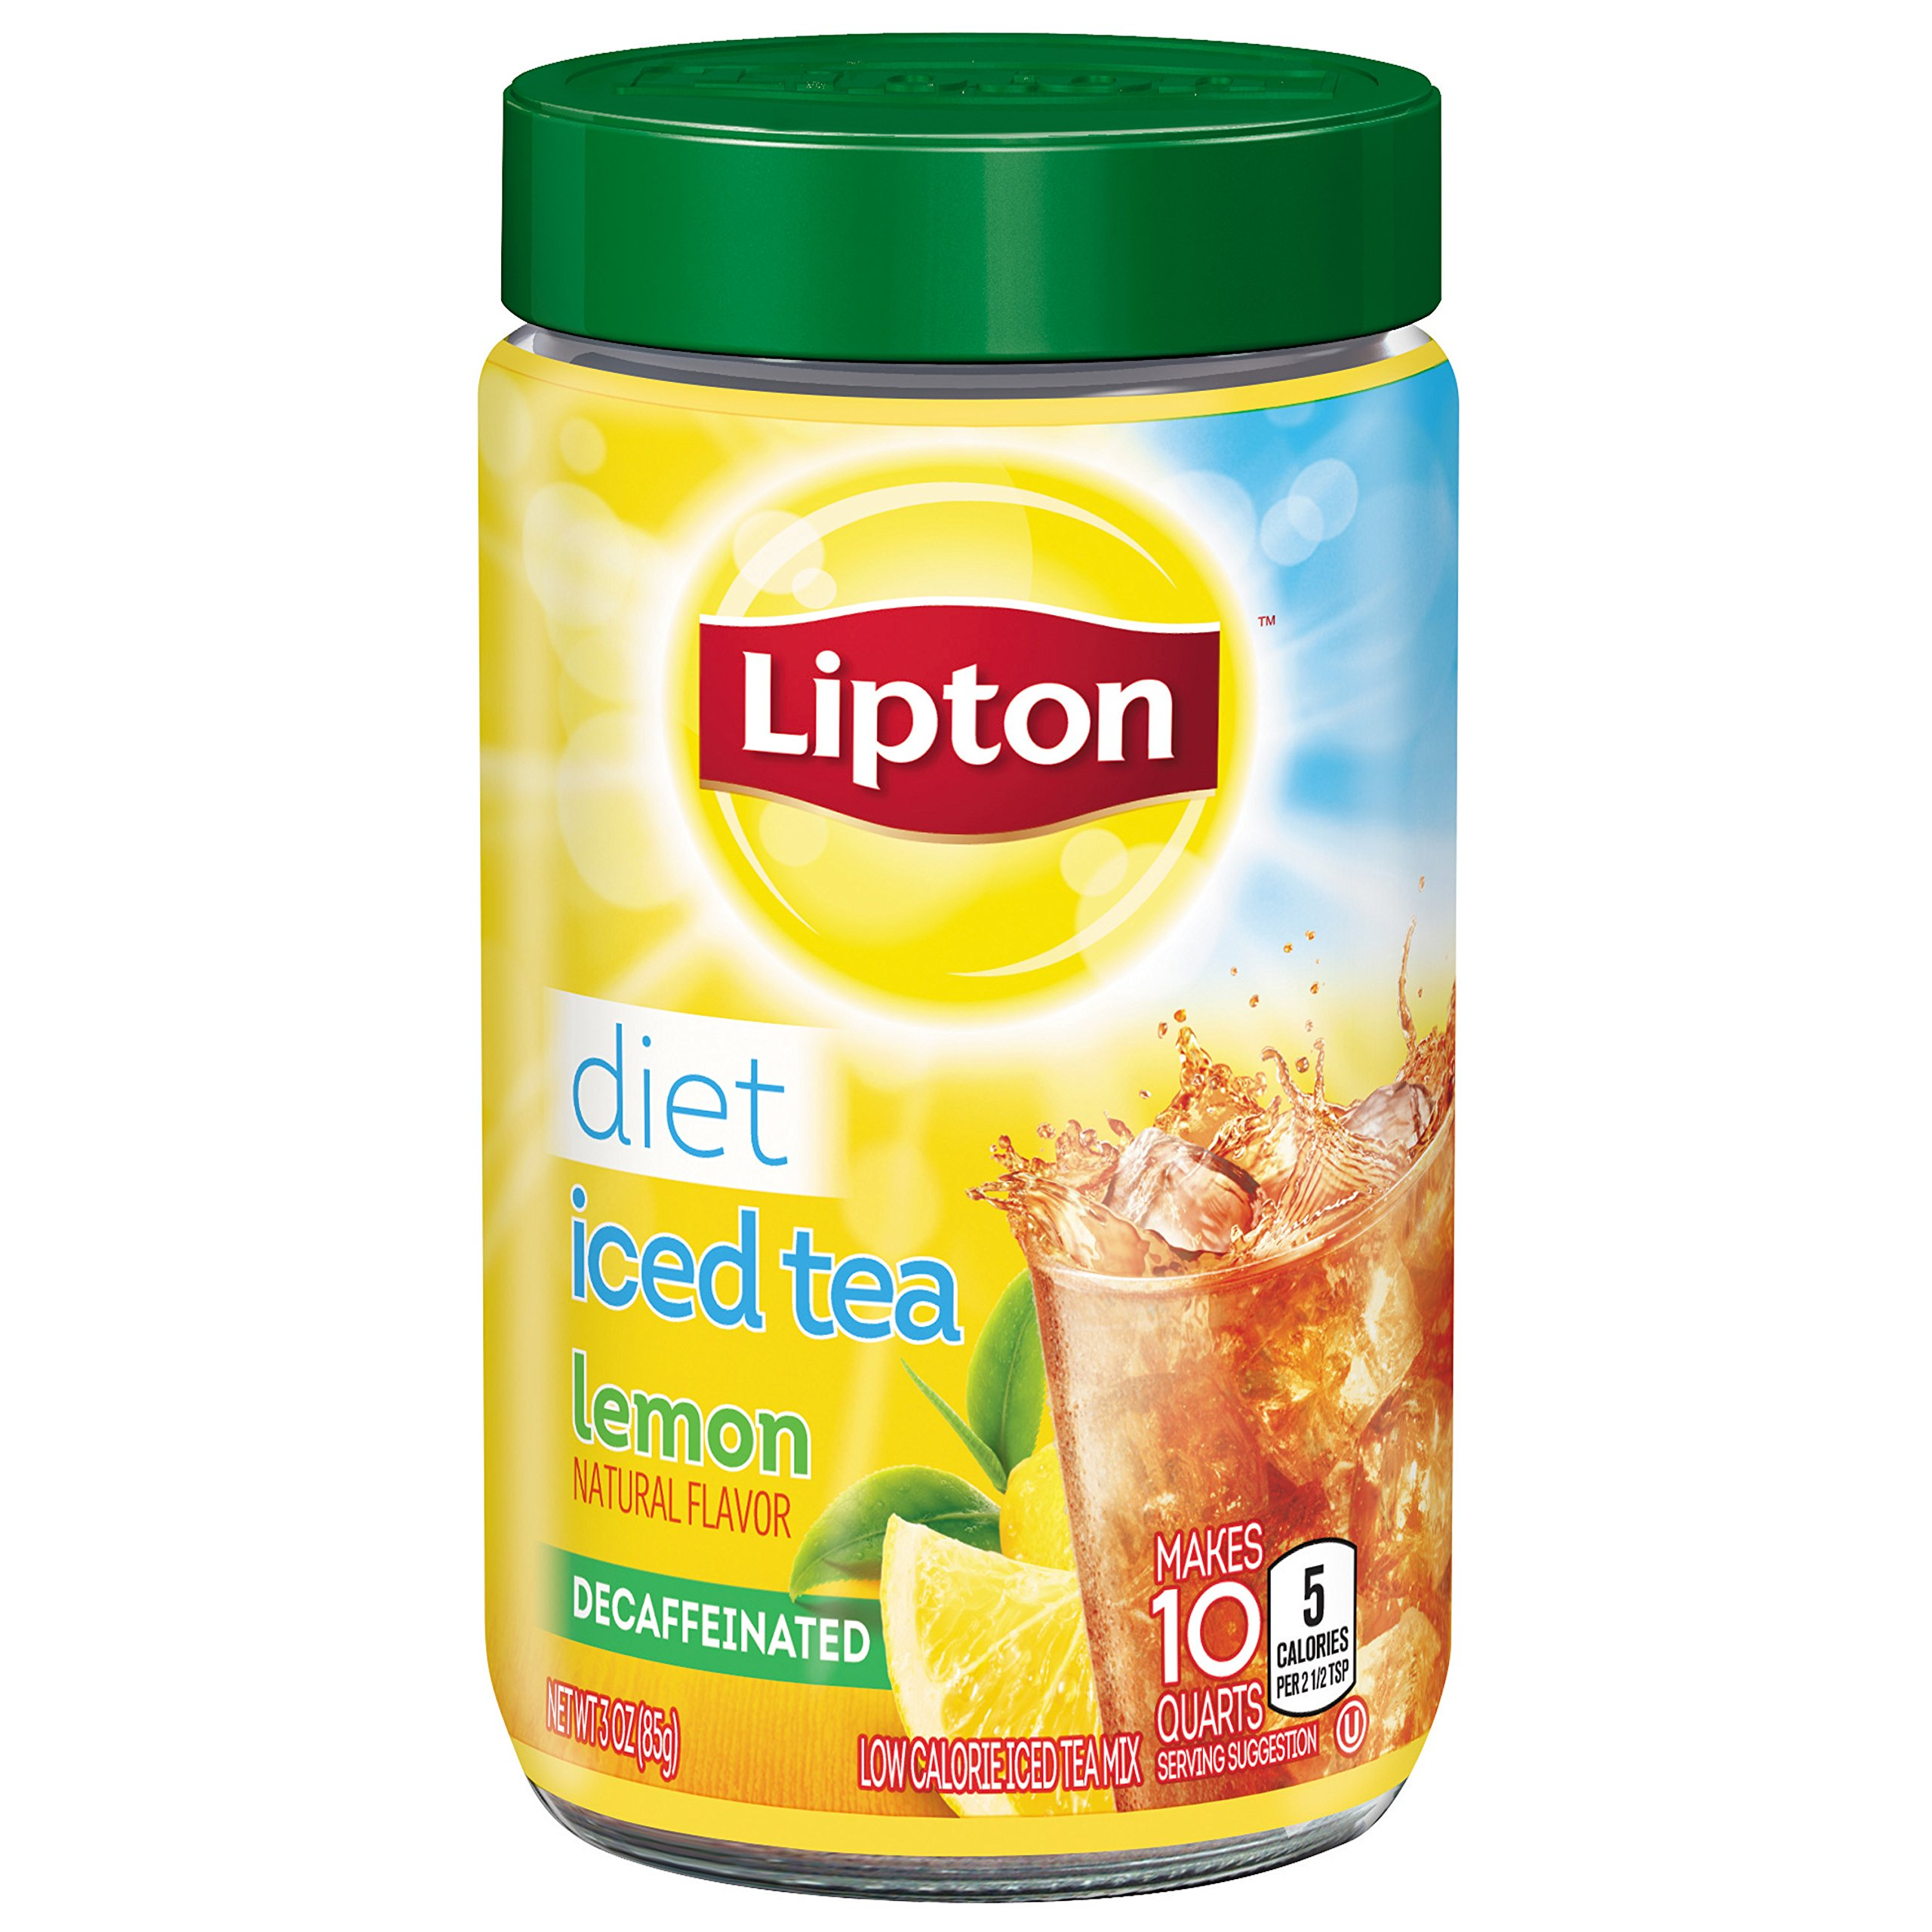 Lipton Iced Tea Mix Diet Decaffeinated Lemon 10 Qt (Pack Of 4) 12